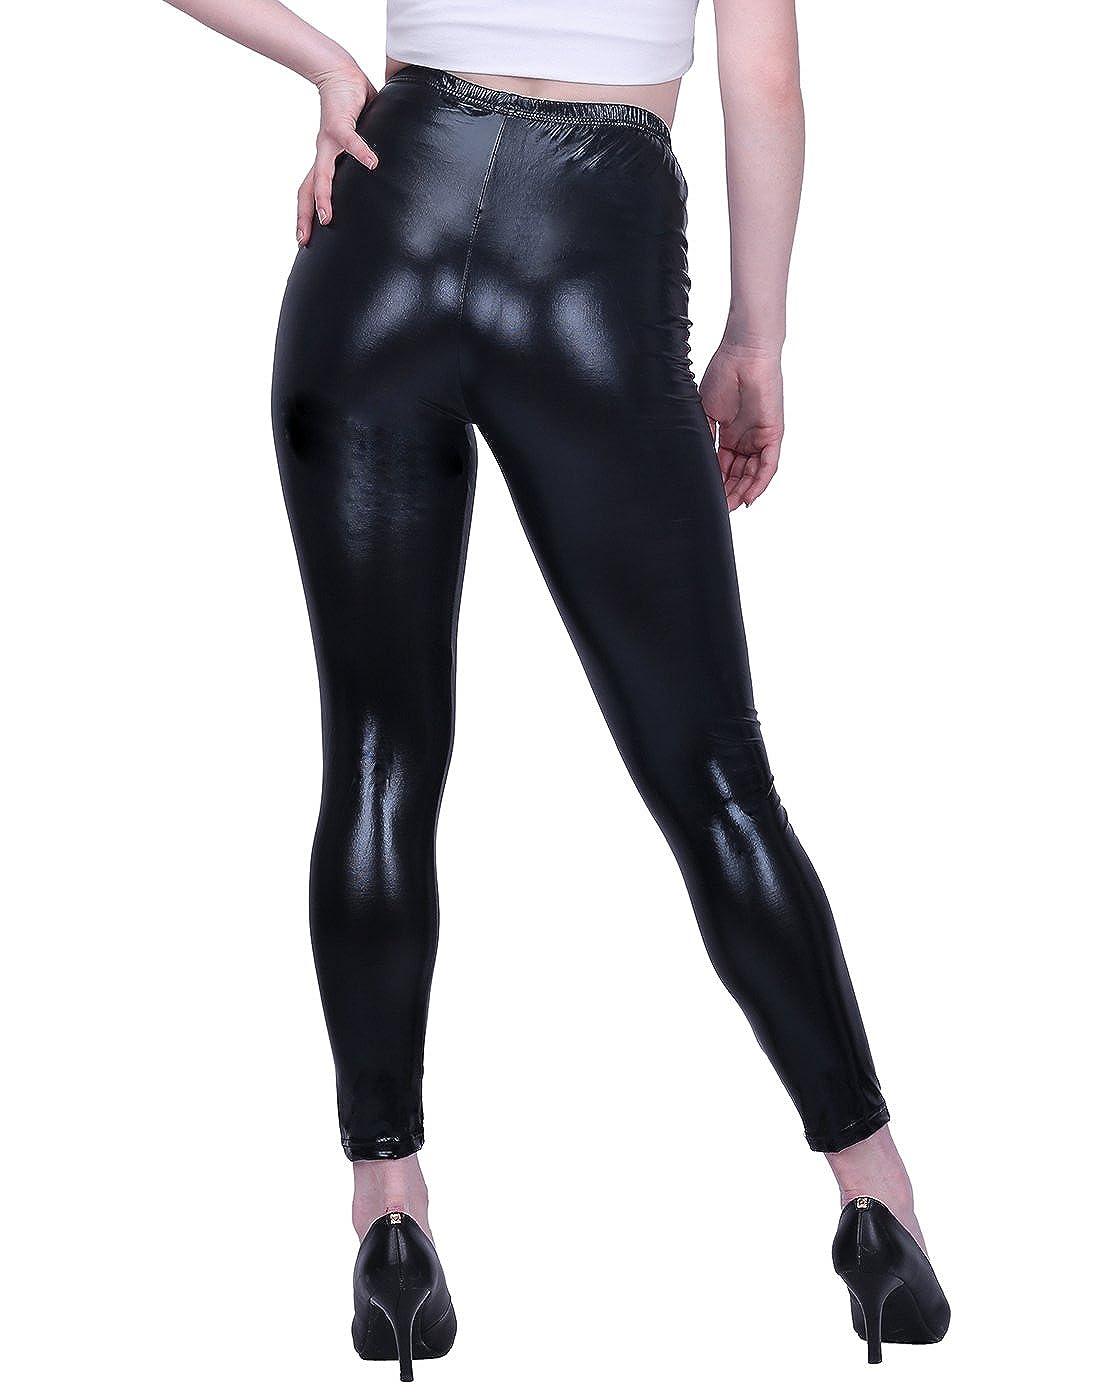 a85f2d0329 HDE Womens Shiny Metallic Leggings Liquid Wet Look Bottoms - Regular Plus  Sizes